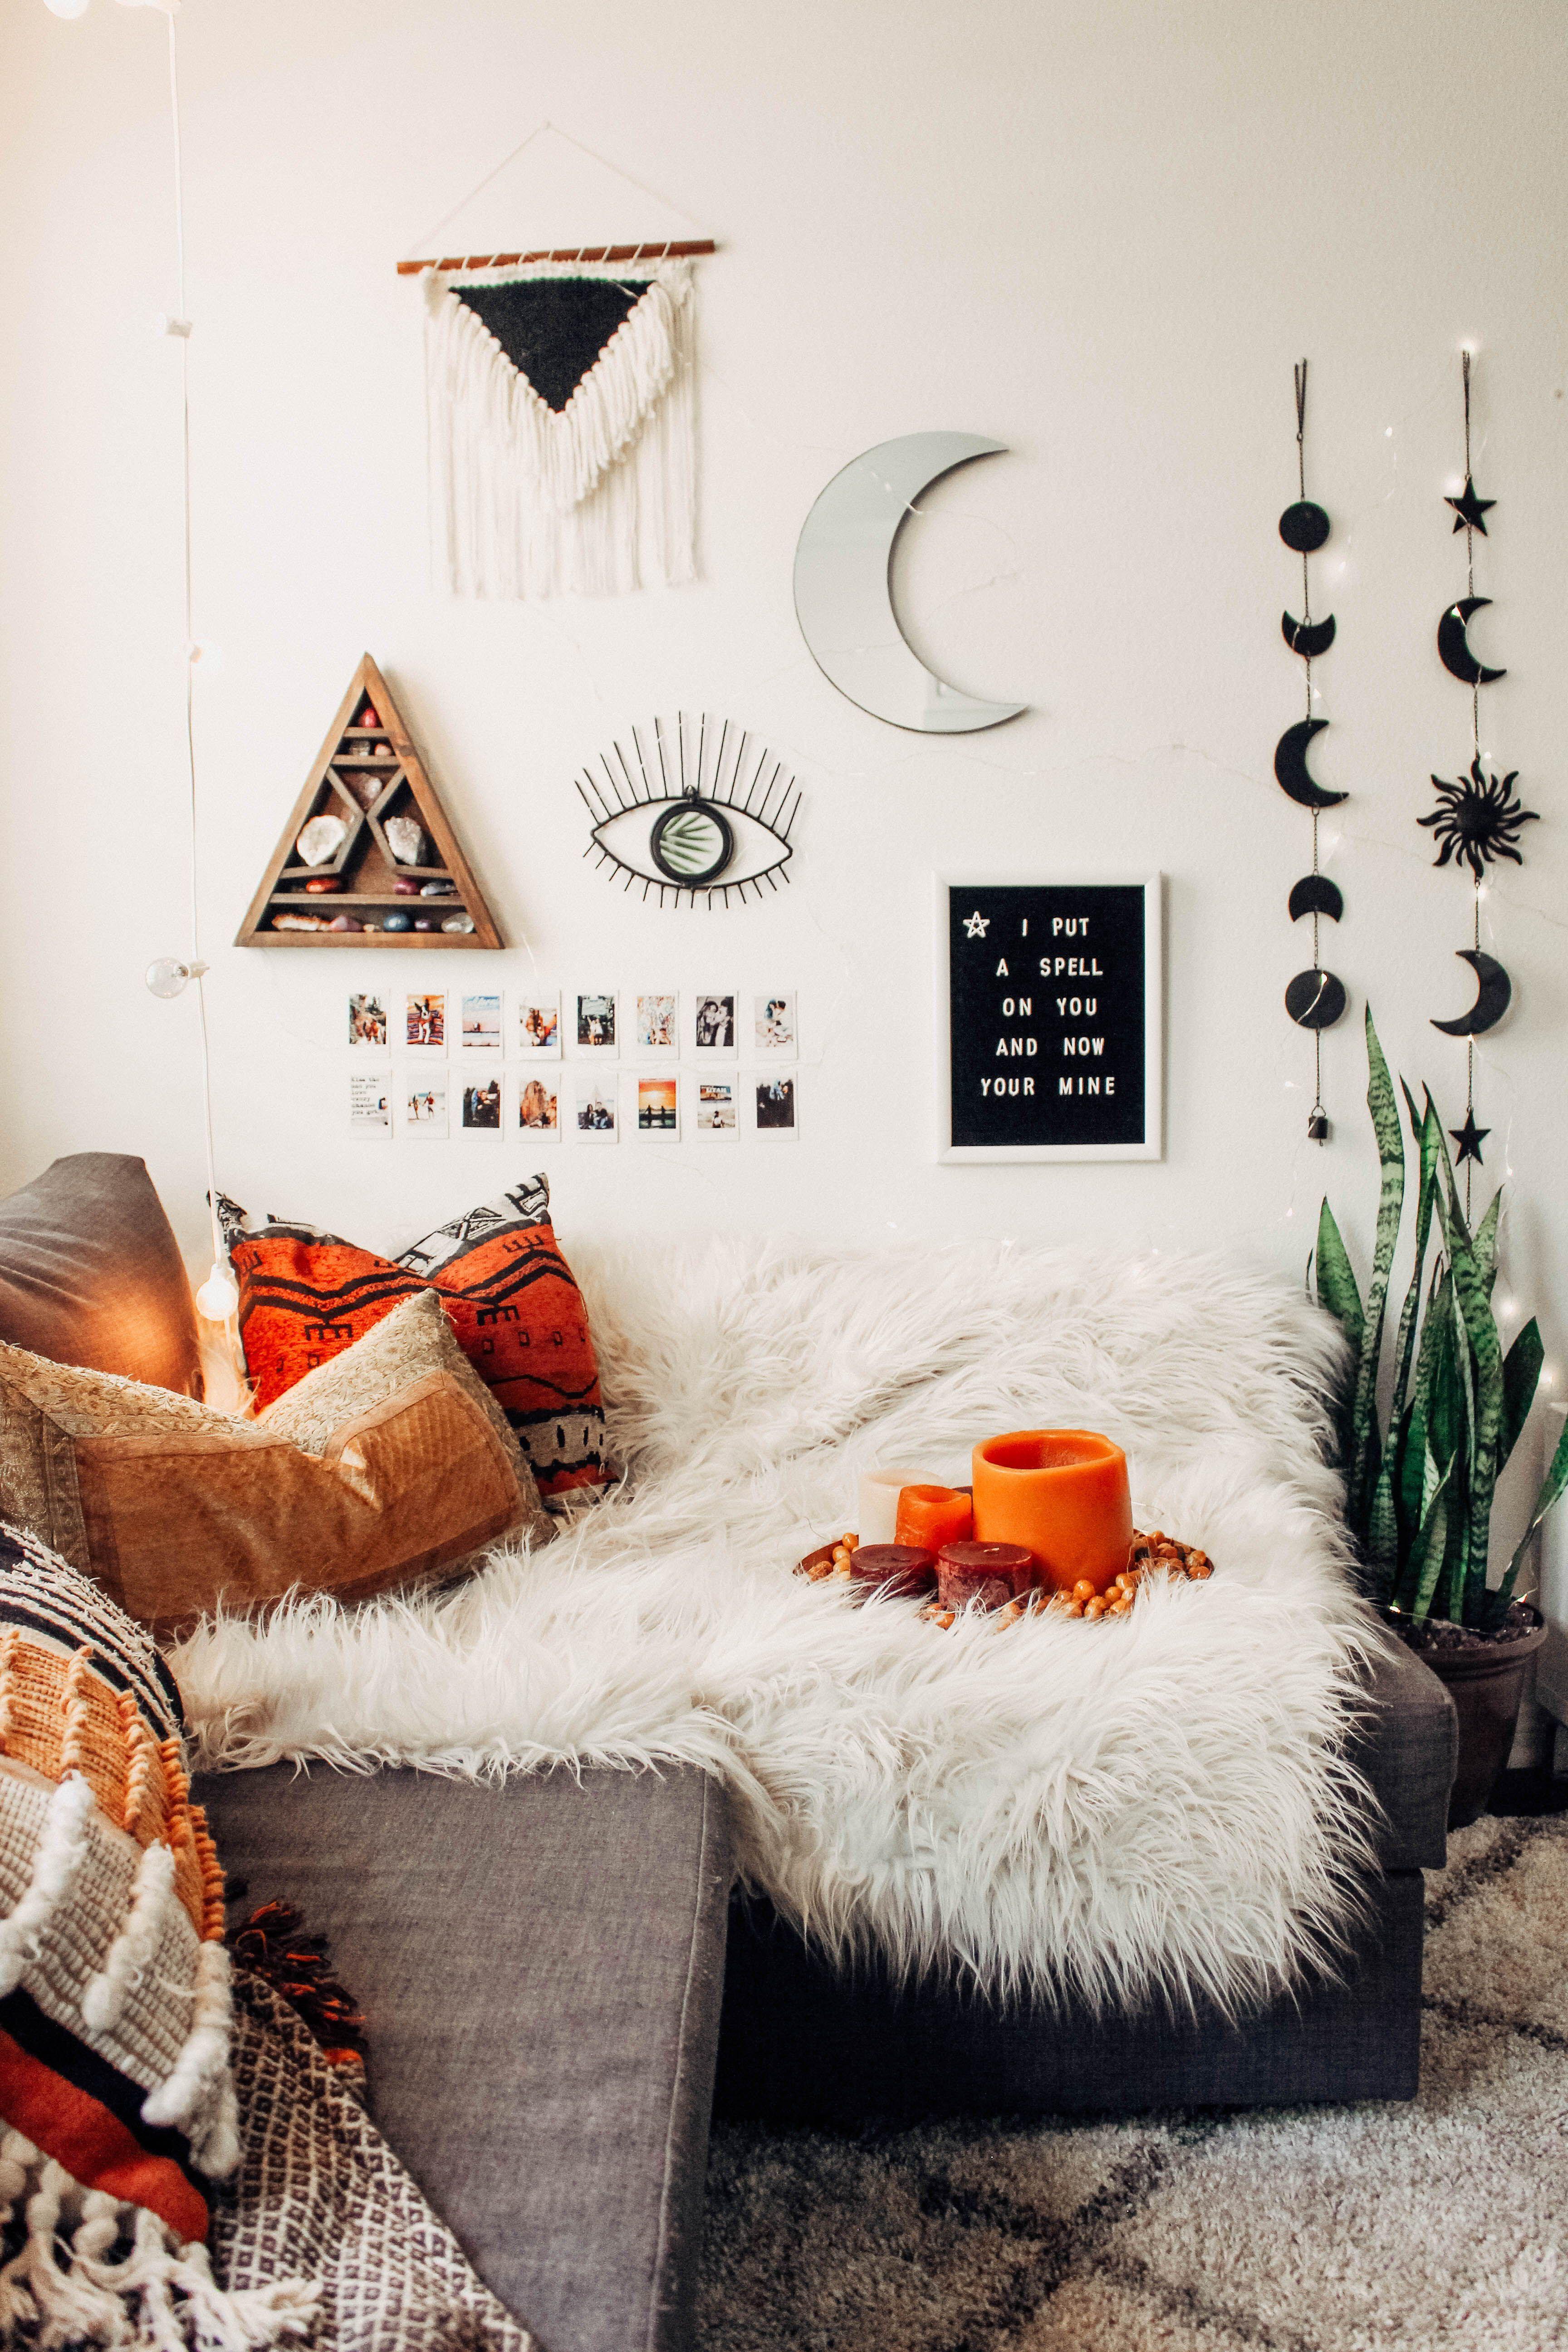 Homedecor homedecorideas mobilia artistic bedroom halloween dream rooms also best home decor images in inspo mint bedrooms rh pinterest